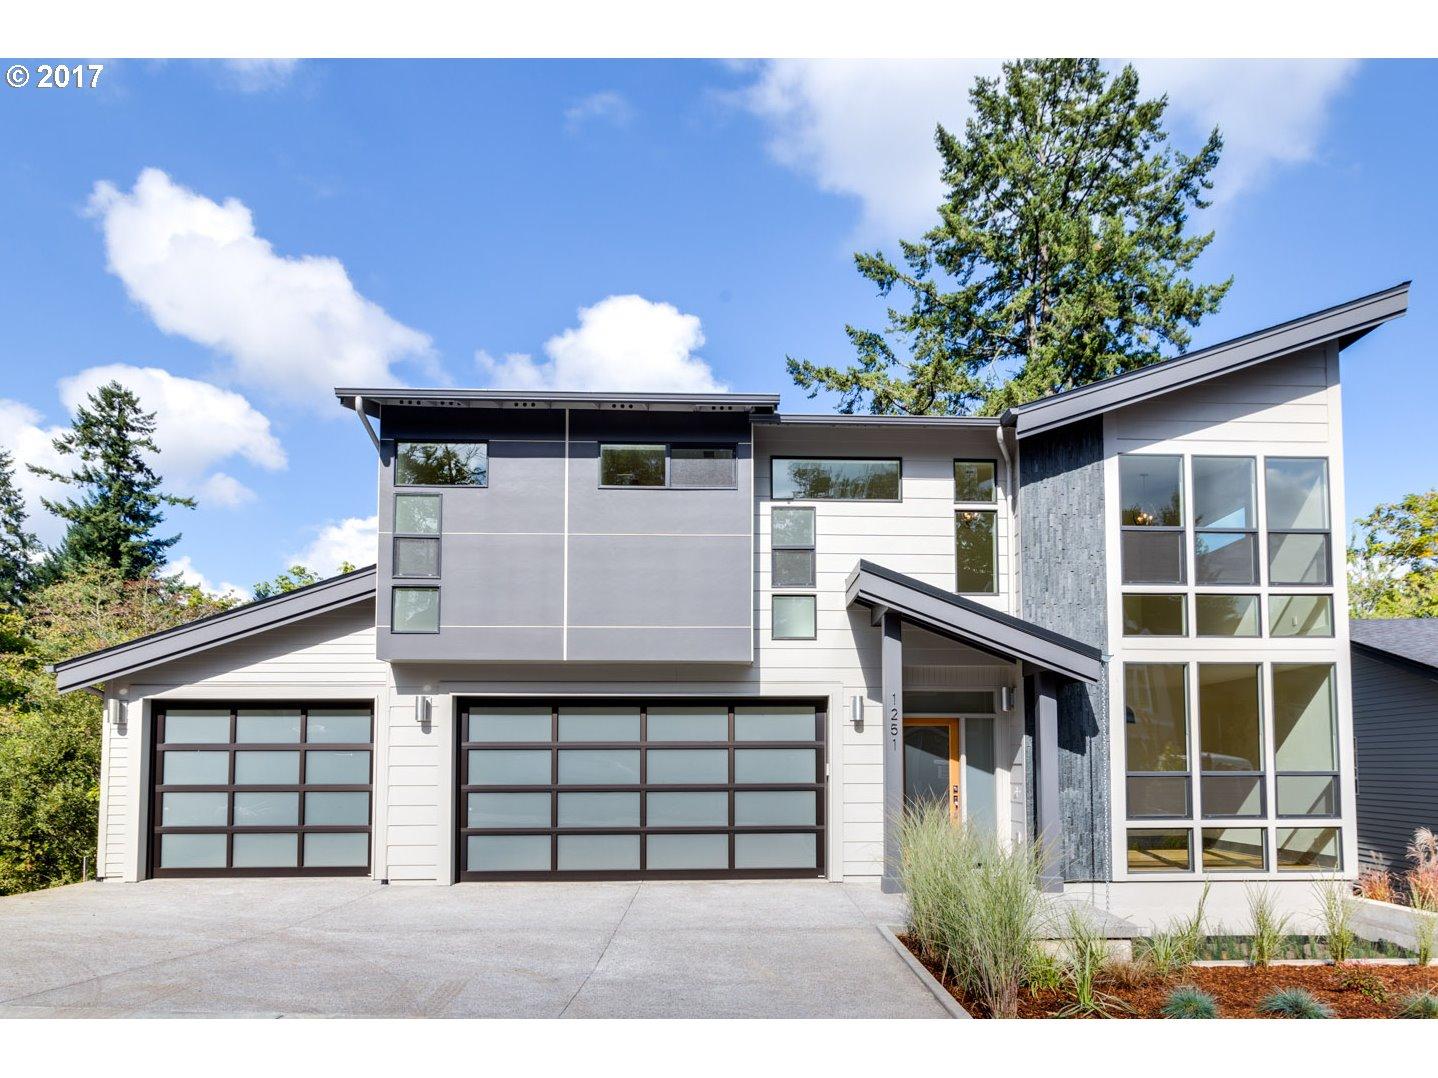 1251 SW OPHELIA ST, Portland, OR 97219